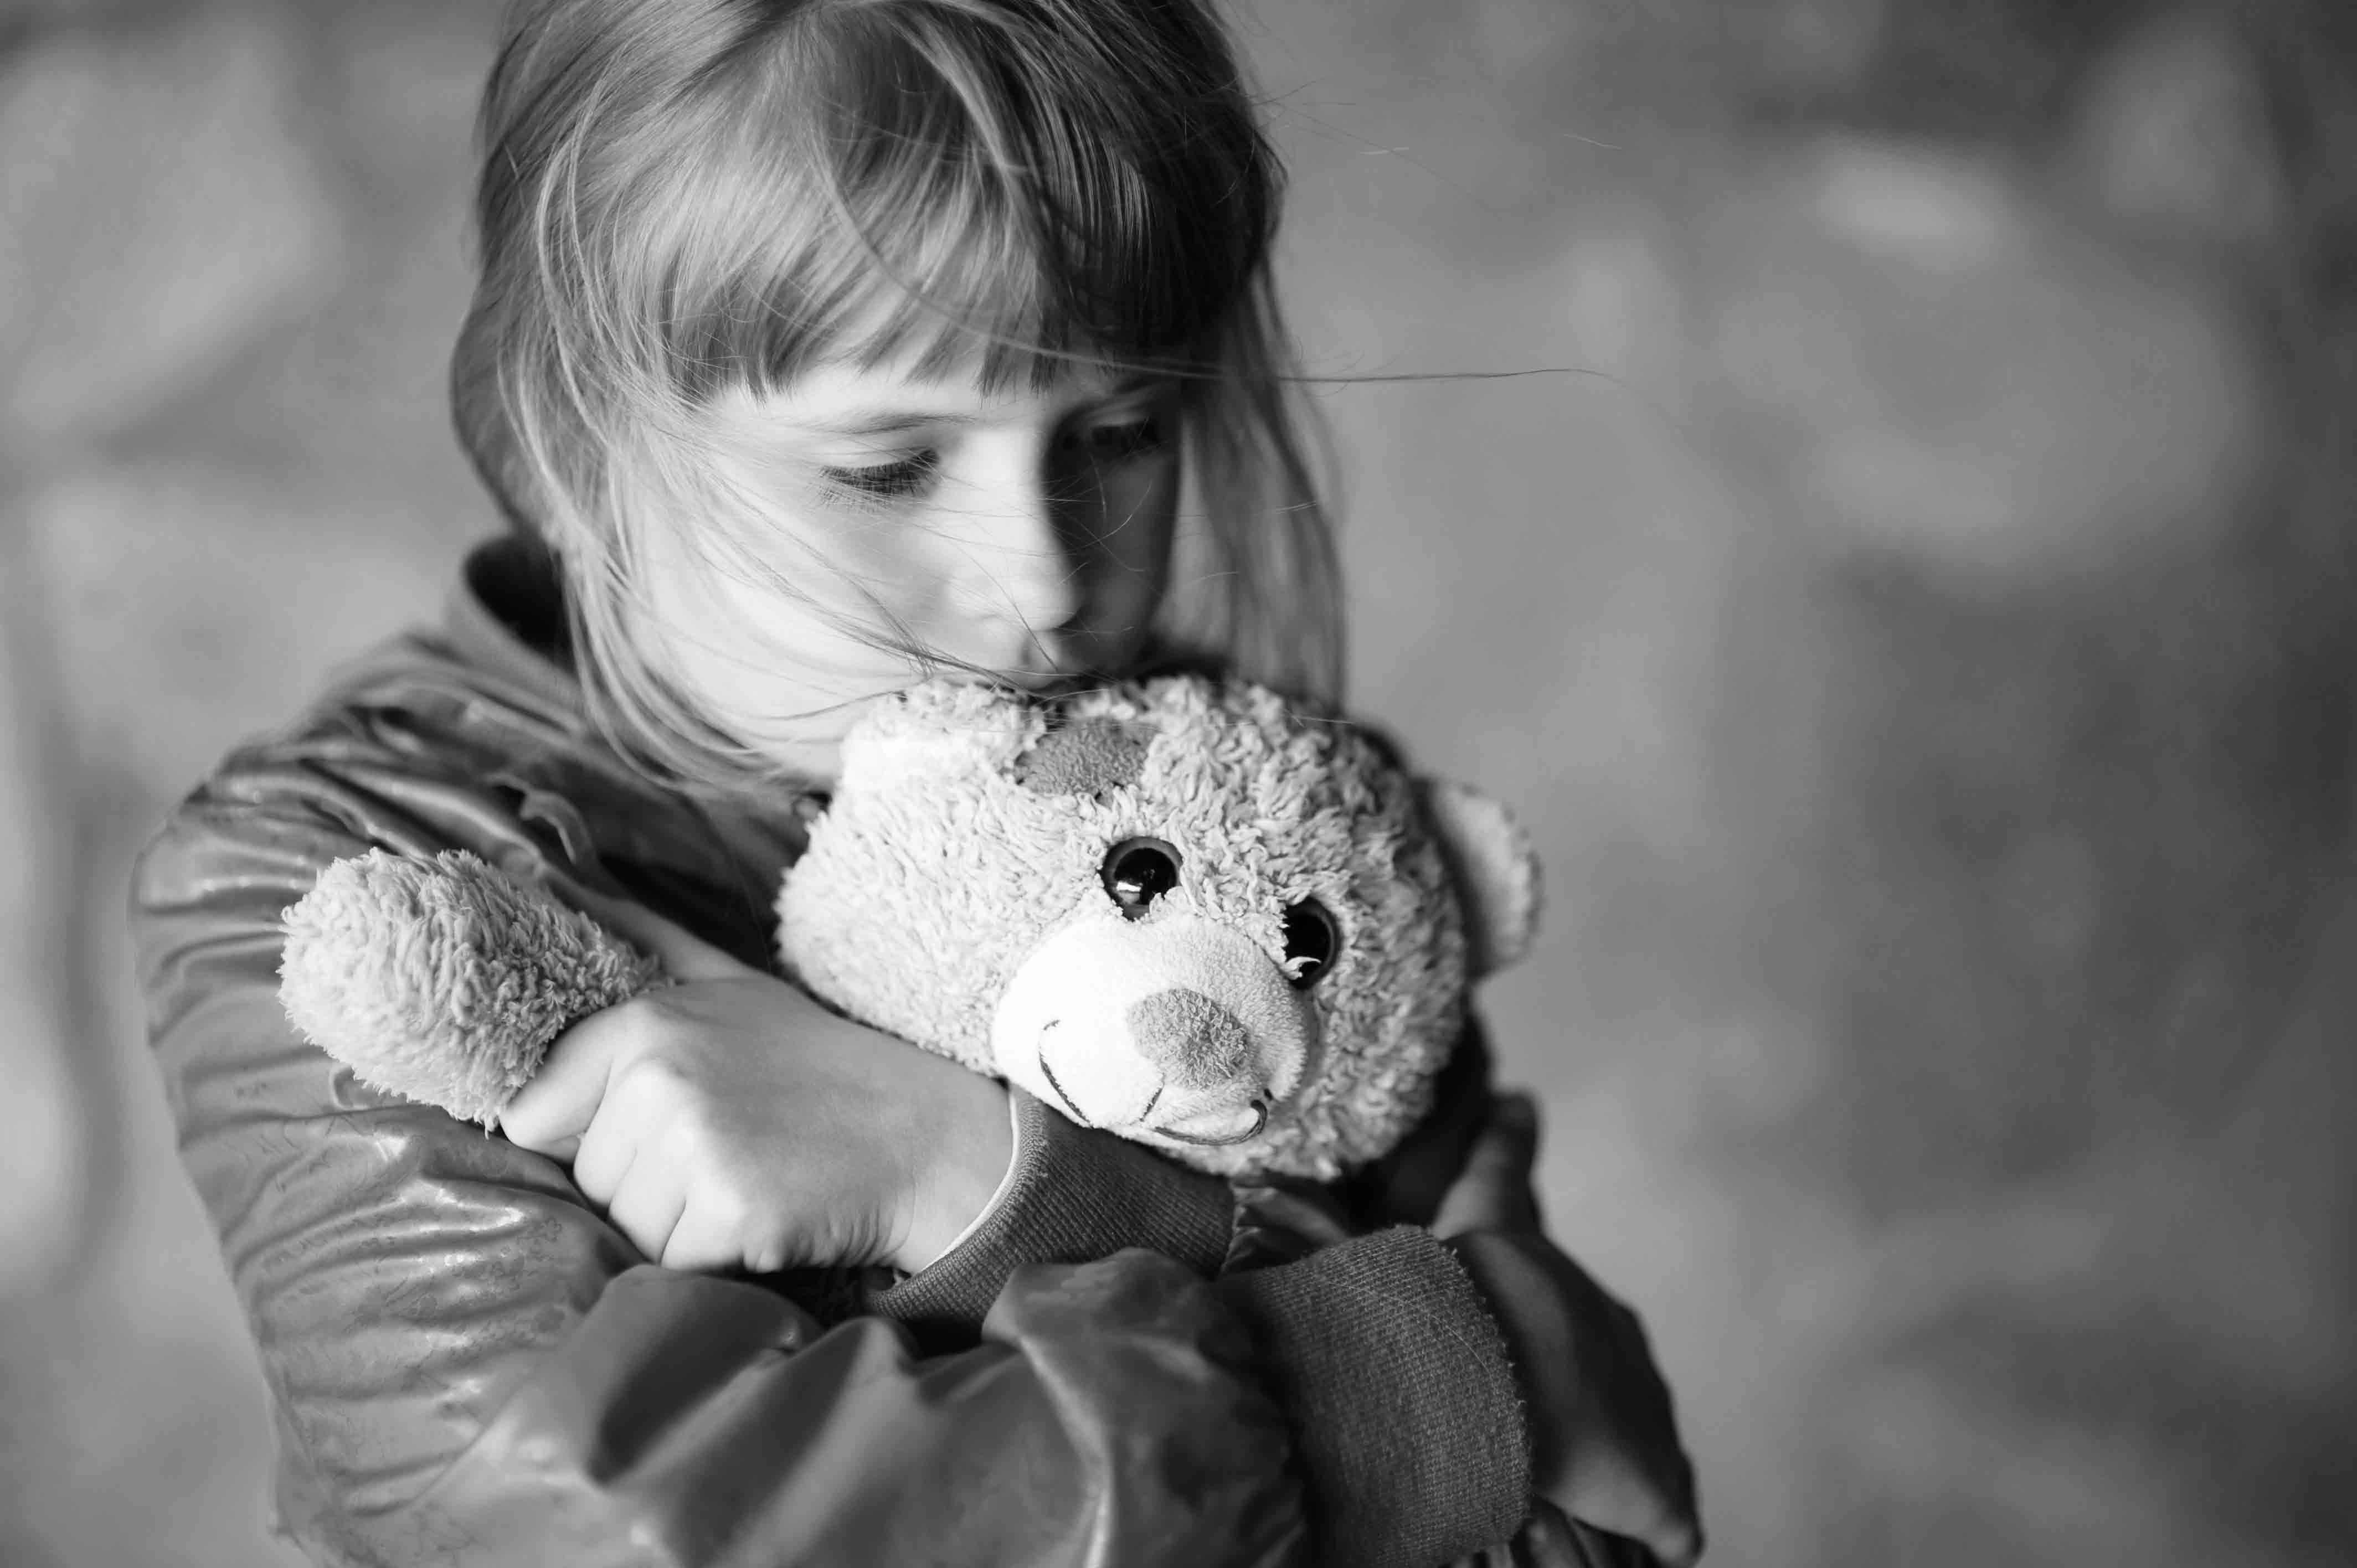 truth-childhood-trauma-and-addiction